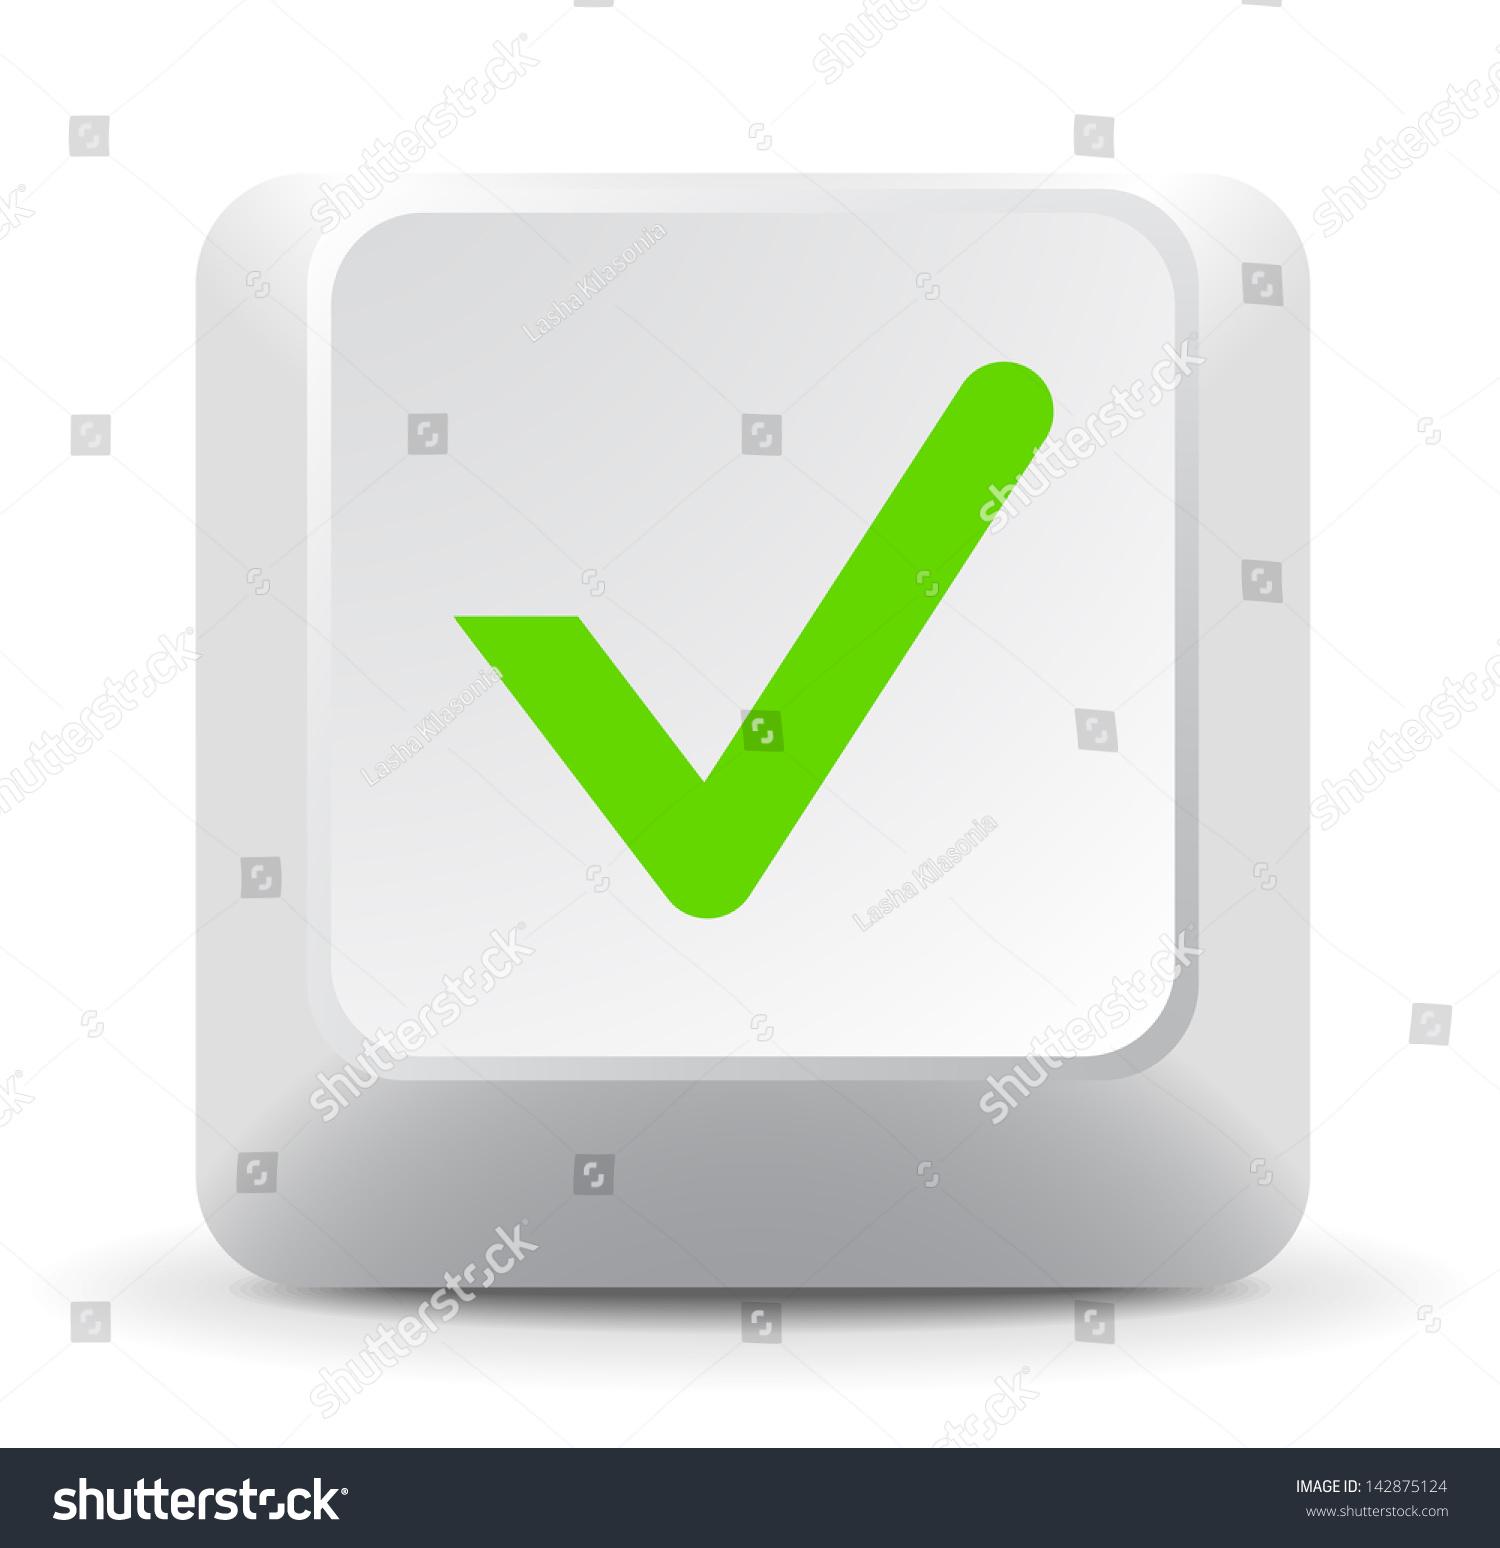 Check Keyboard Key Stock Vector Royalty Free 142875124 Shutterstock